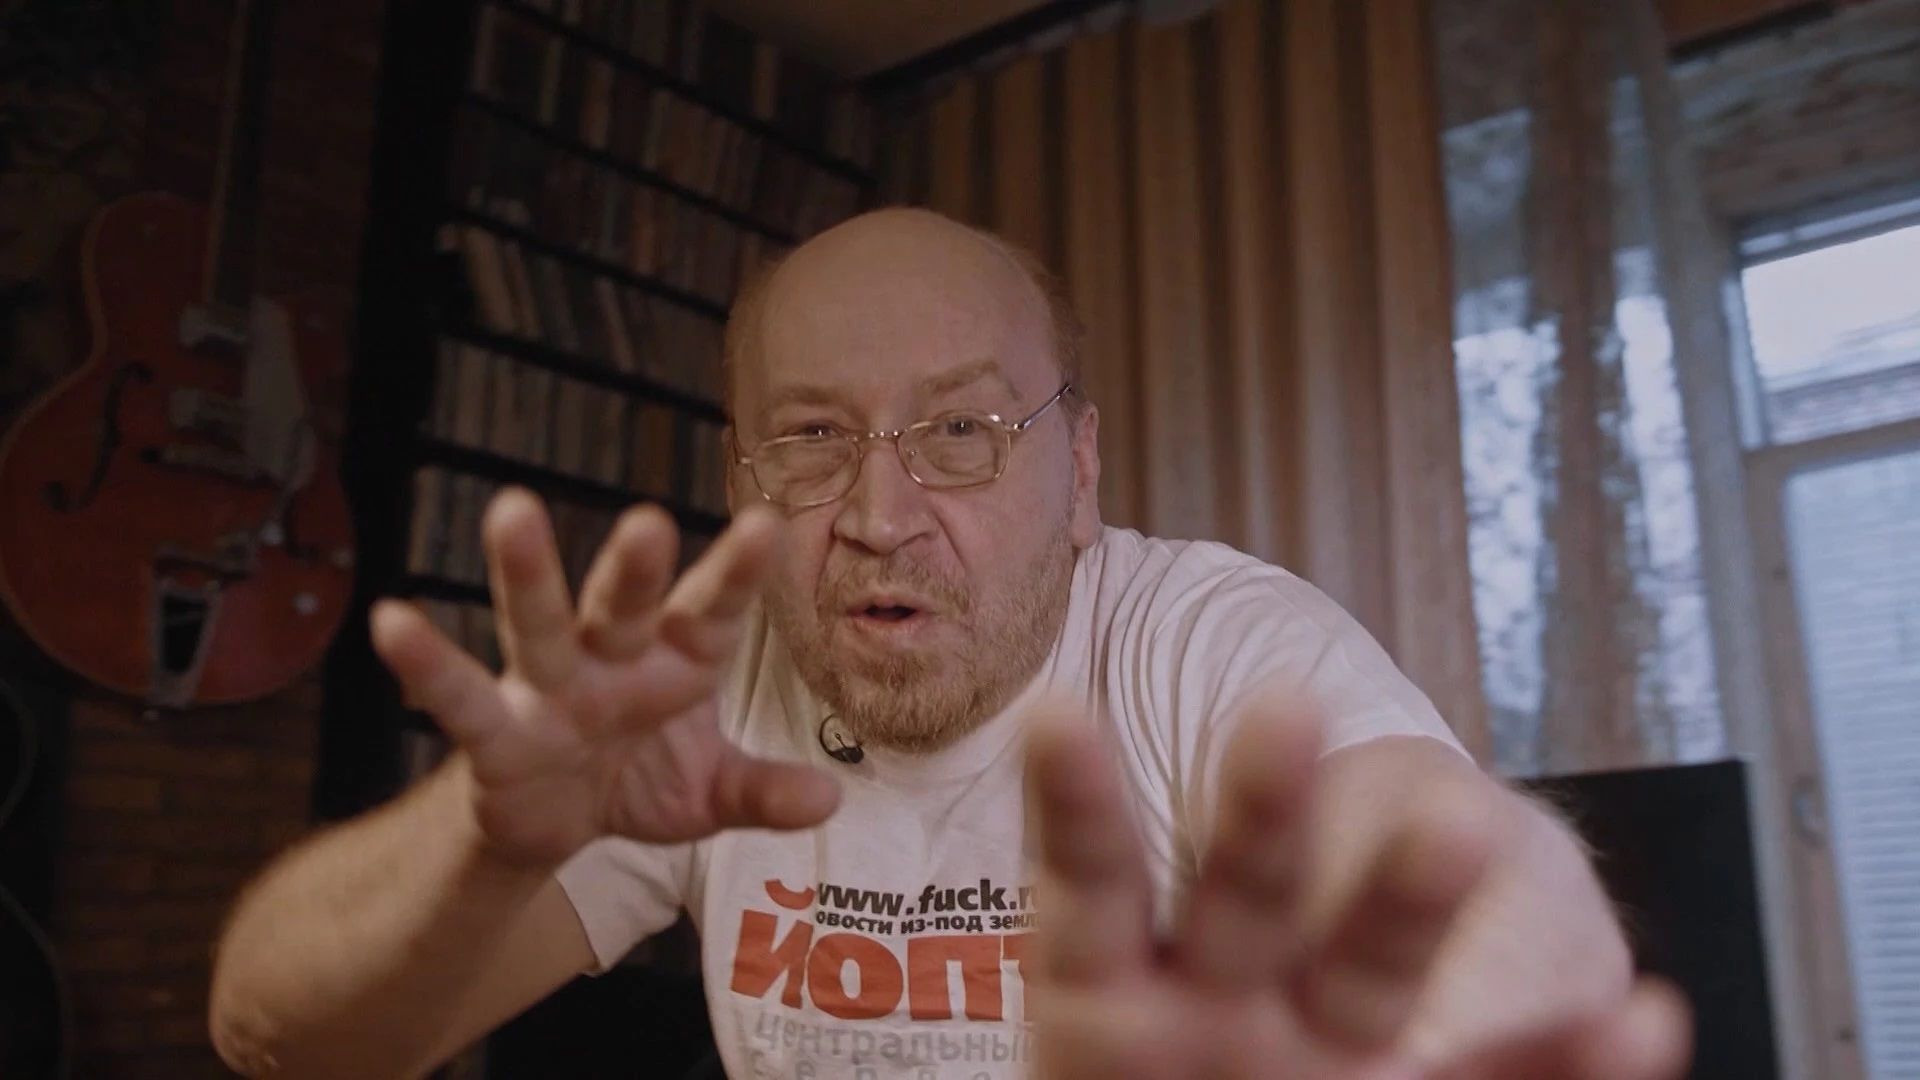 Холивар. История рунета — s01e02 — Контркультура: пАдонки, марихуана и Кремль